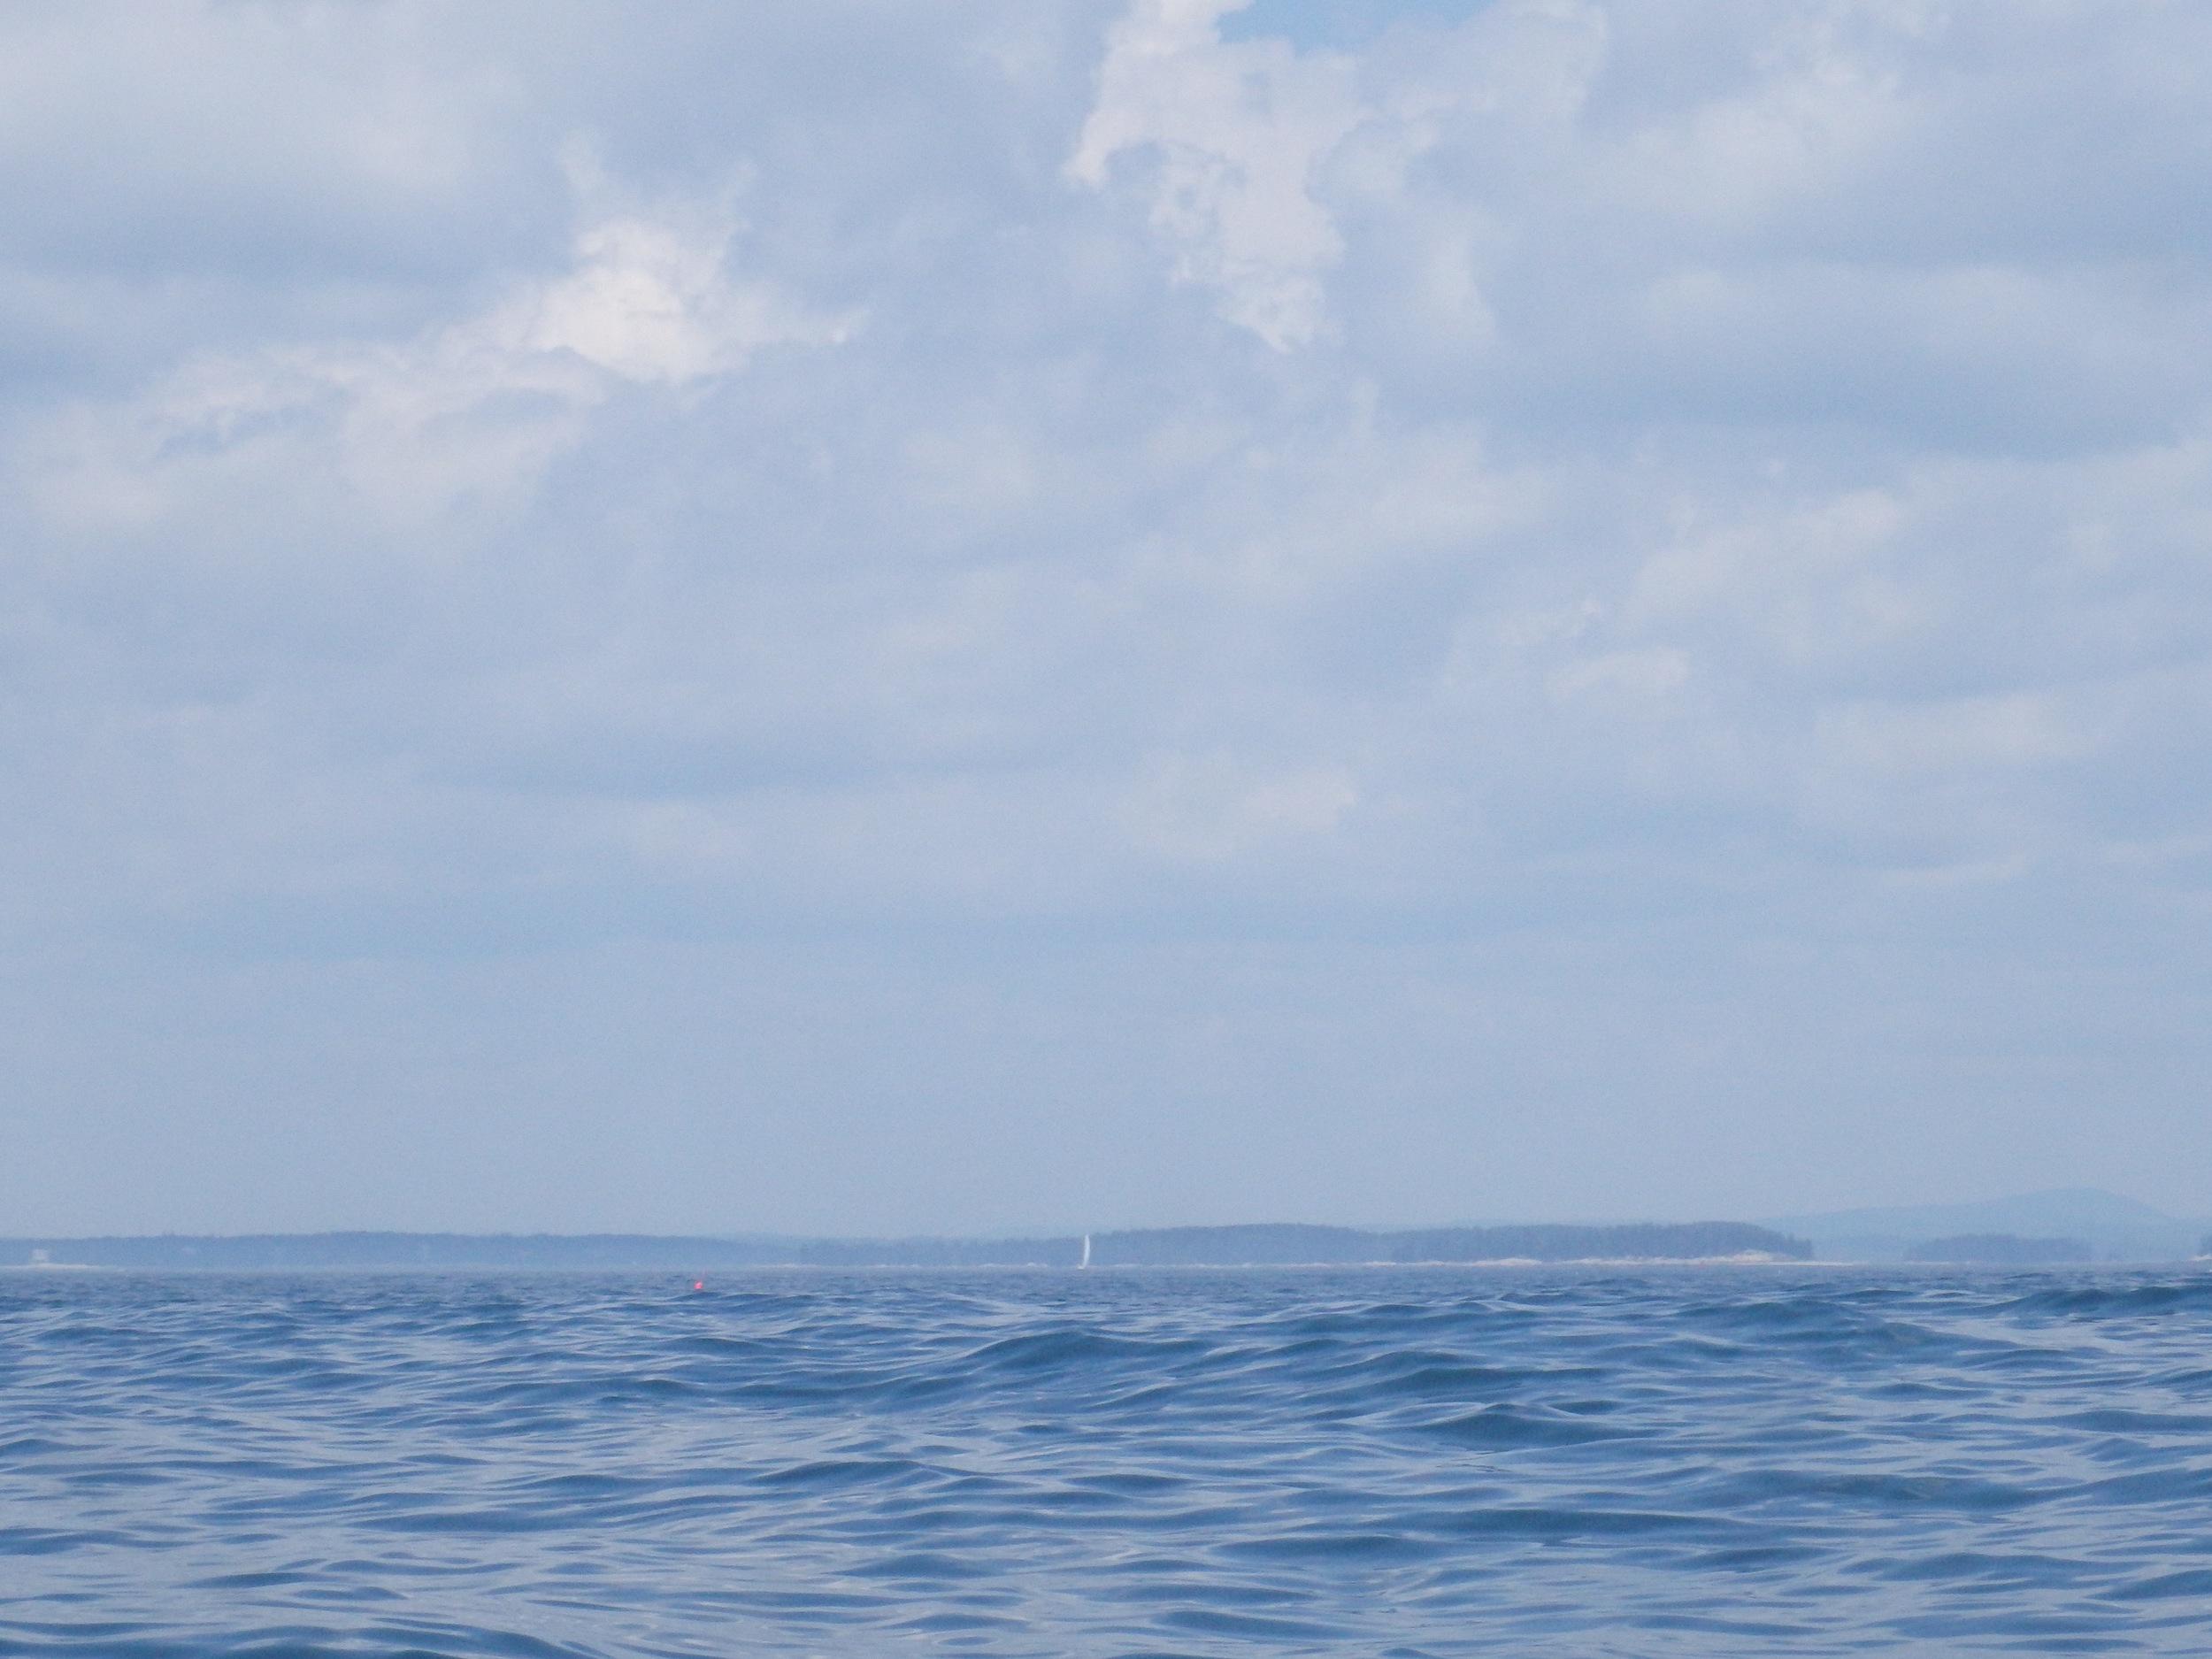 Looking towards Tenants Harbor